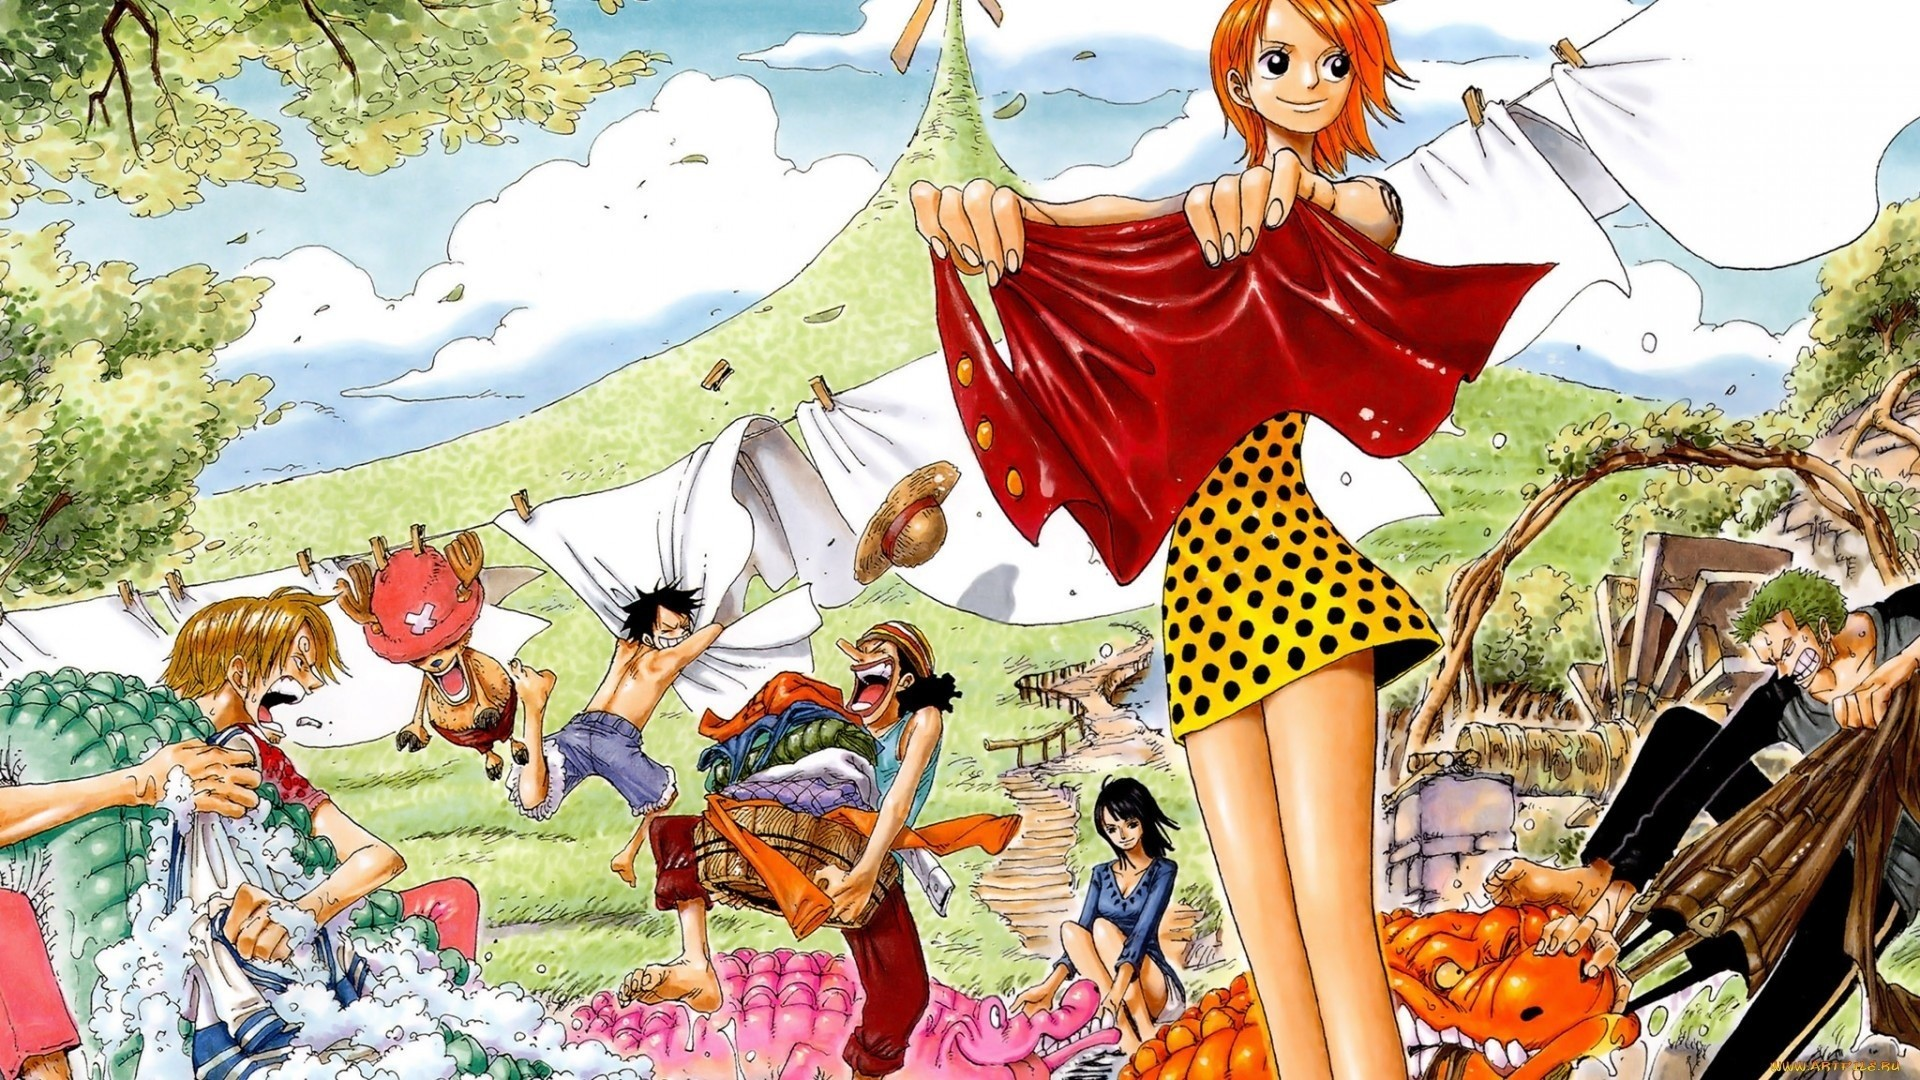 Res: 1920x1080, One Piece Nami Wallpaper 42